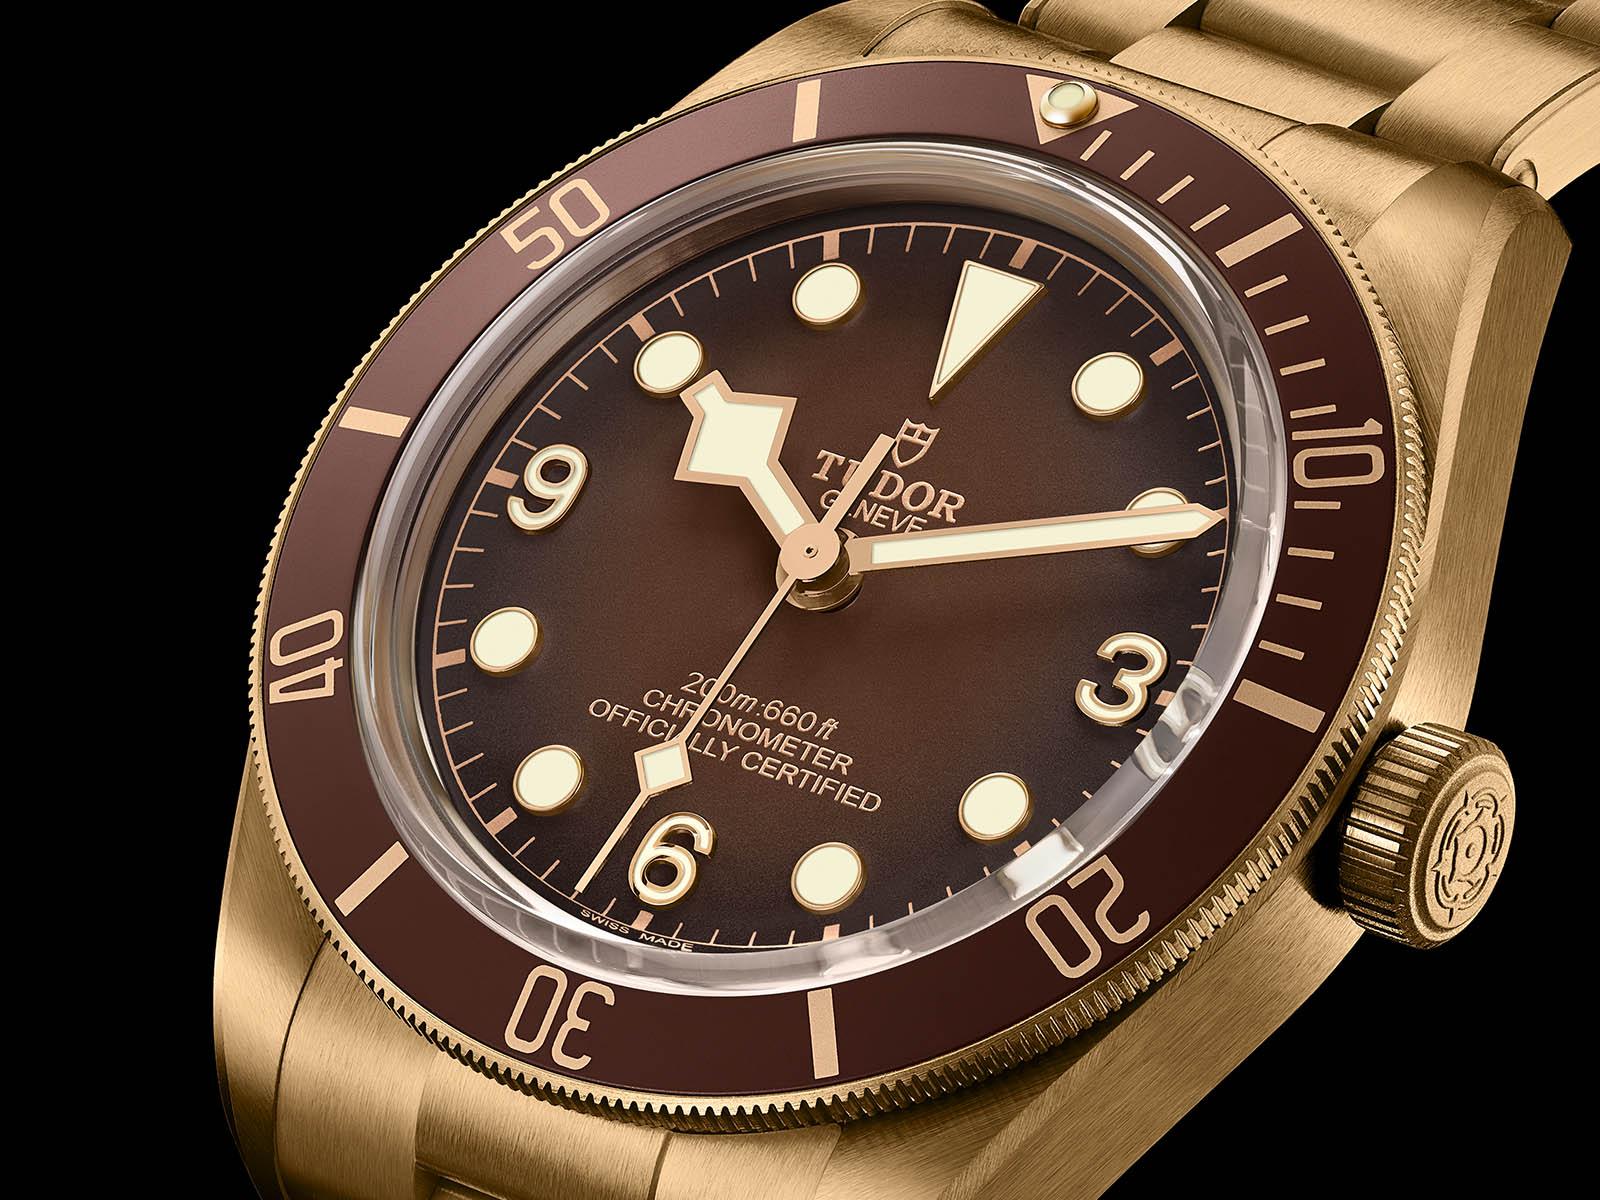 m79012m-0001-tudor-black-bay-fifty-eight-bronze-boutique-edition-5.jpg